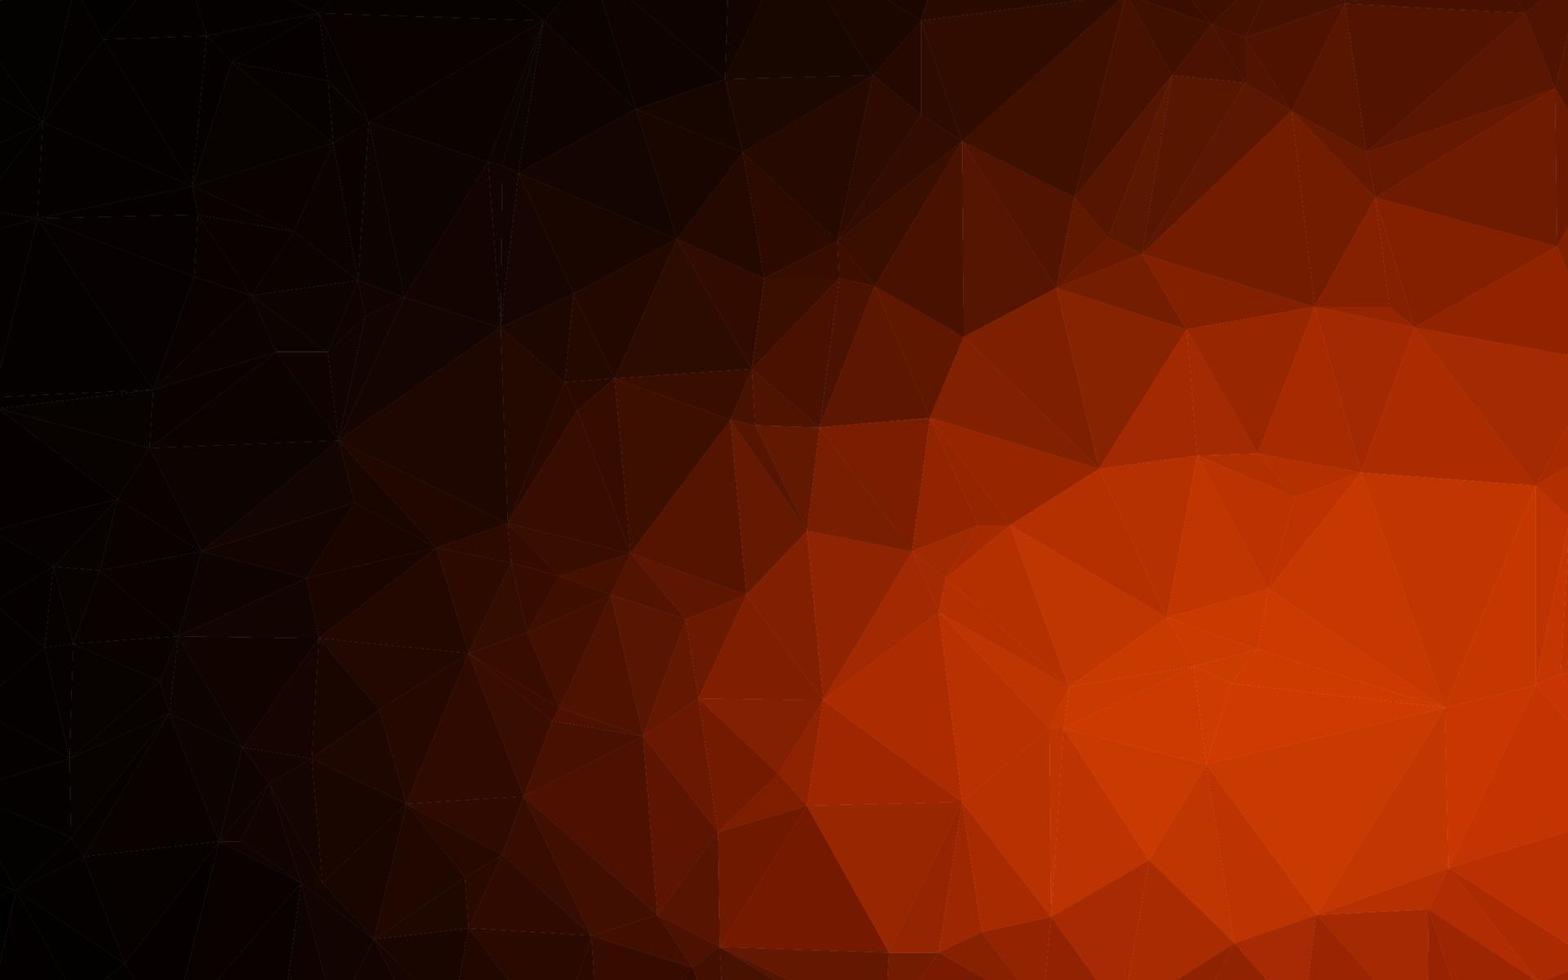 cenário de mosaico abstrato de vetor laranja escuro.